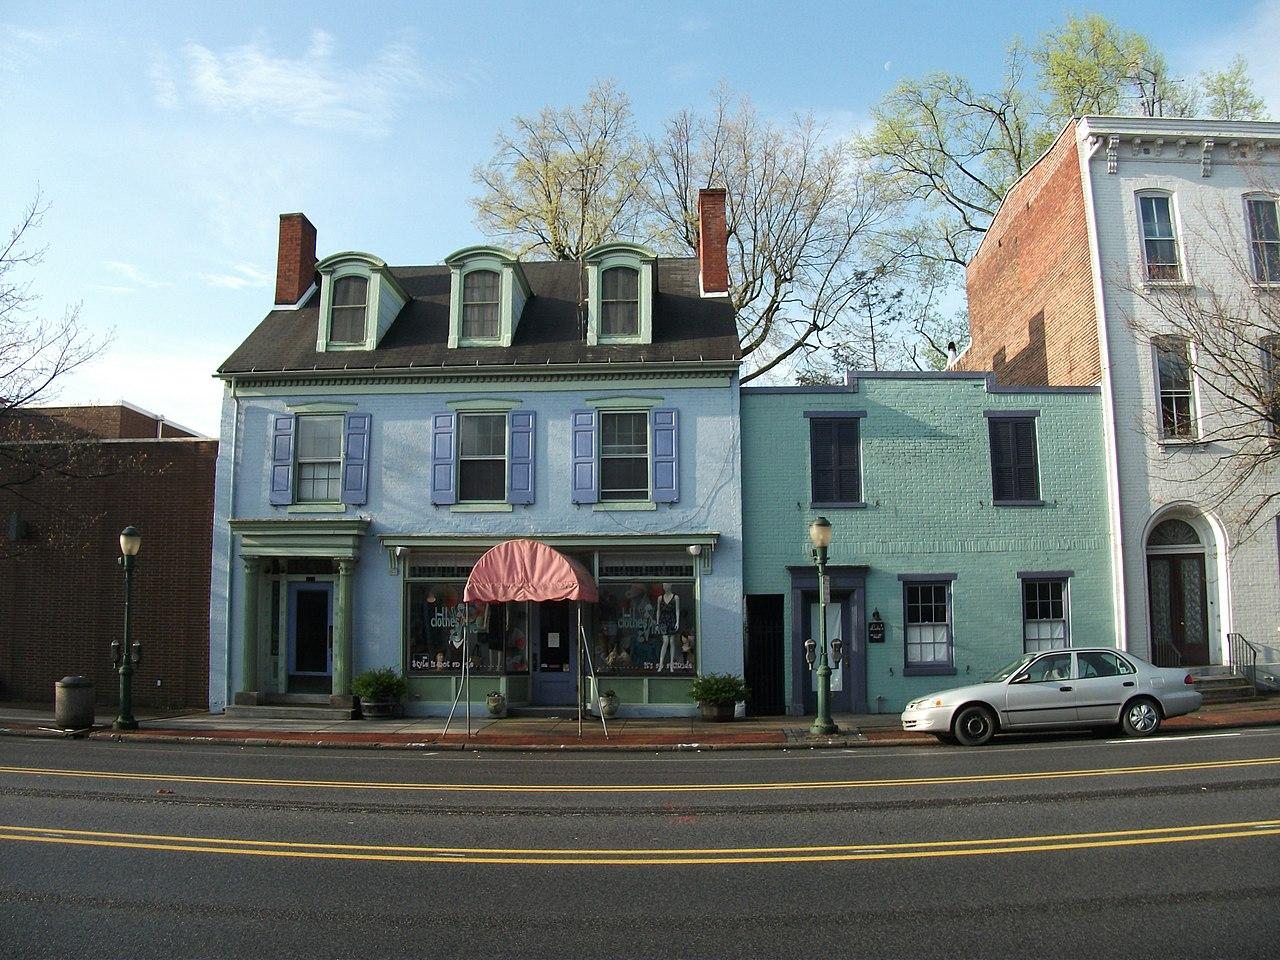 carlisle pa dating Cl pennsylvania choose the site nearest you: altoona-johnstown cumberland valley erie harrisburg.